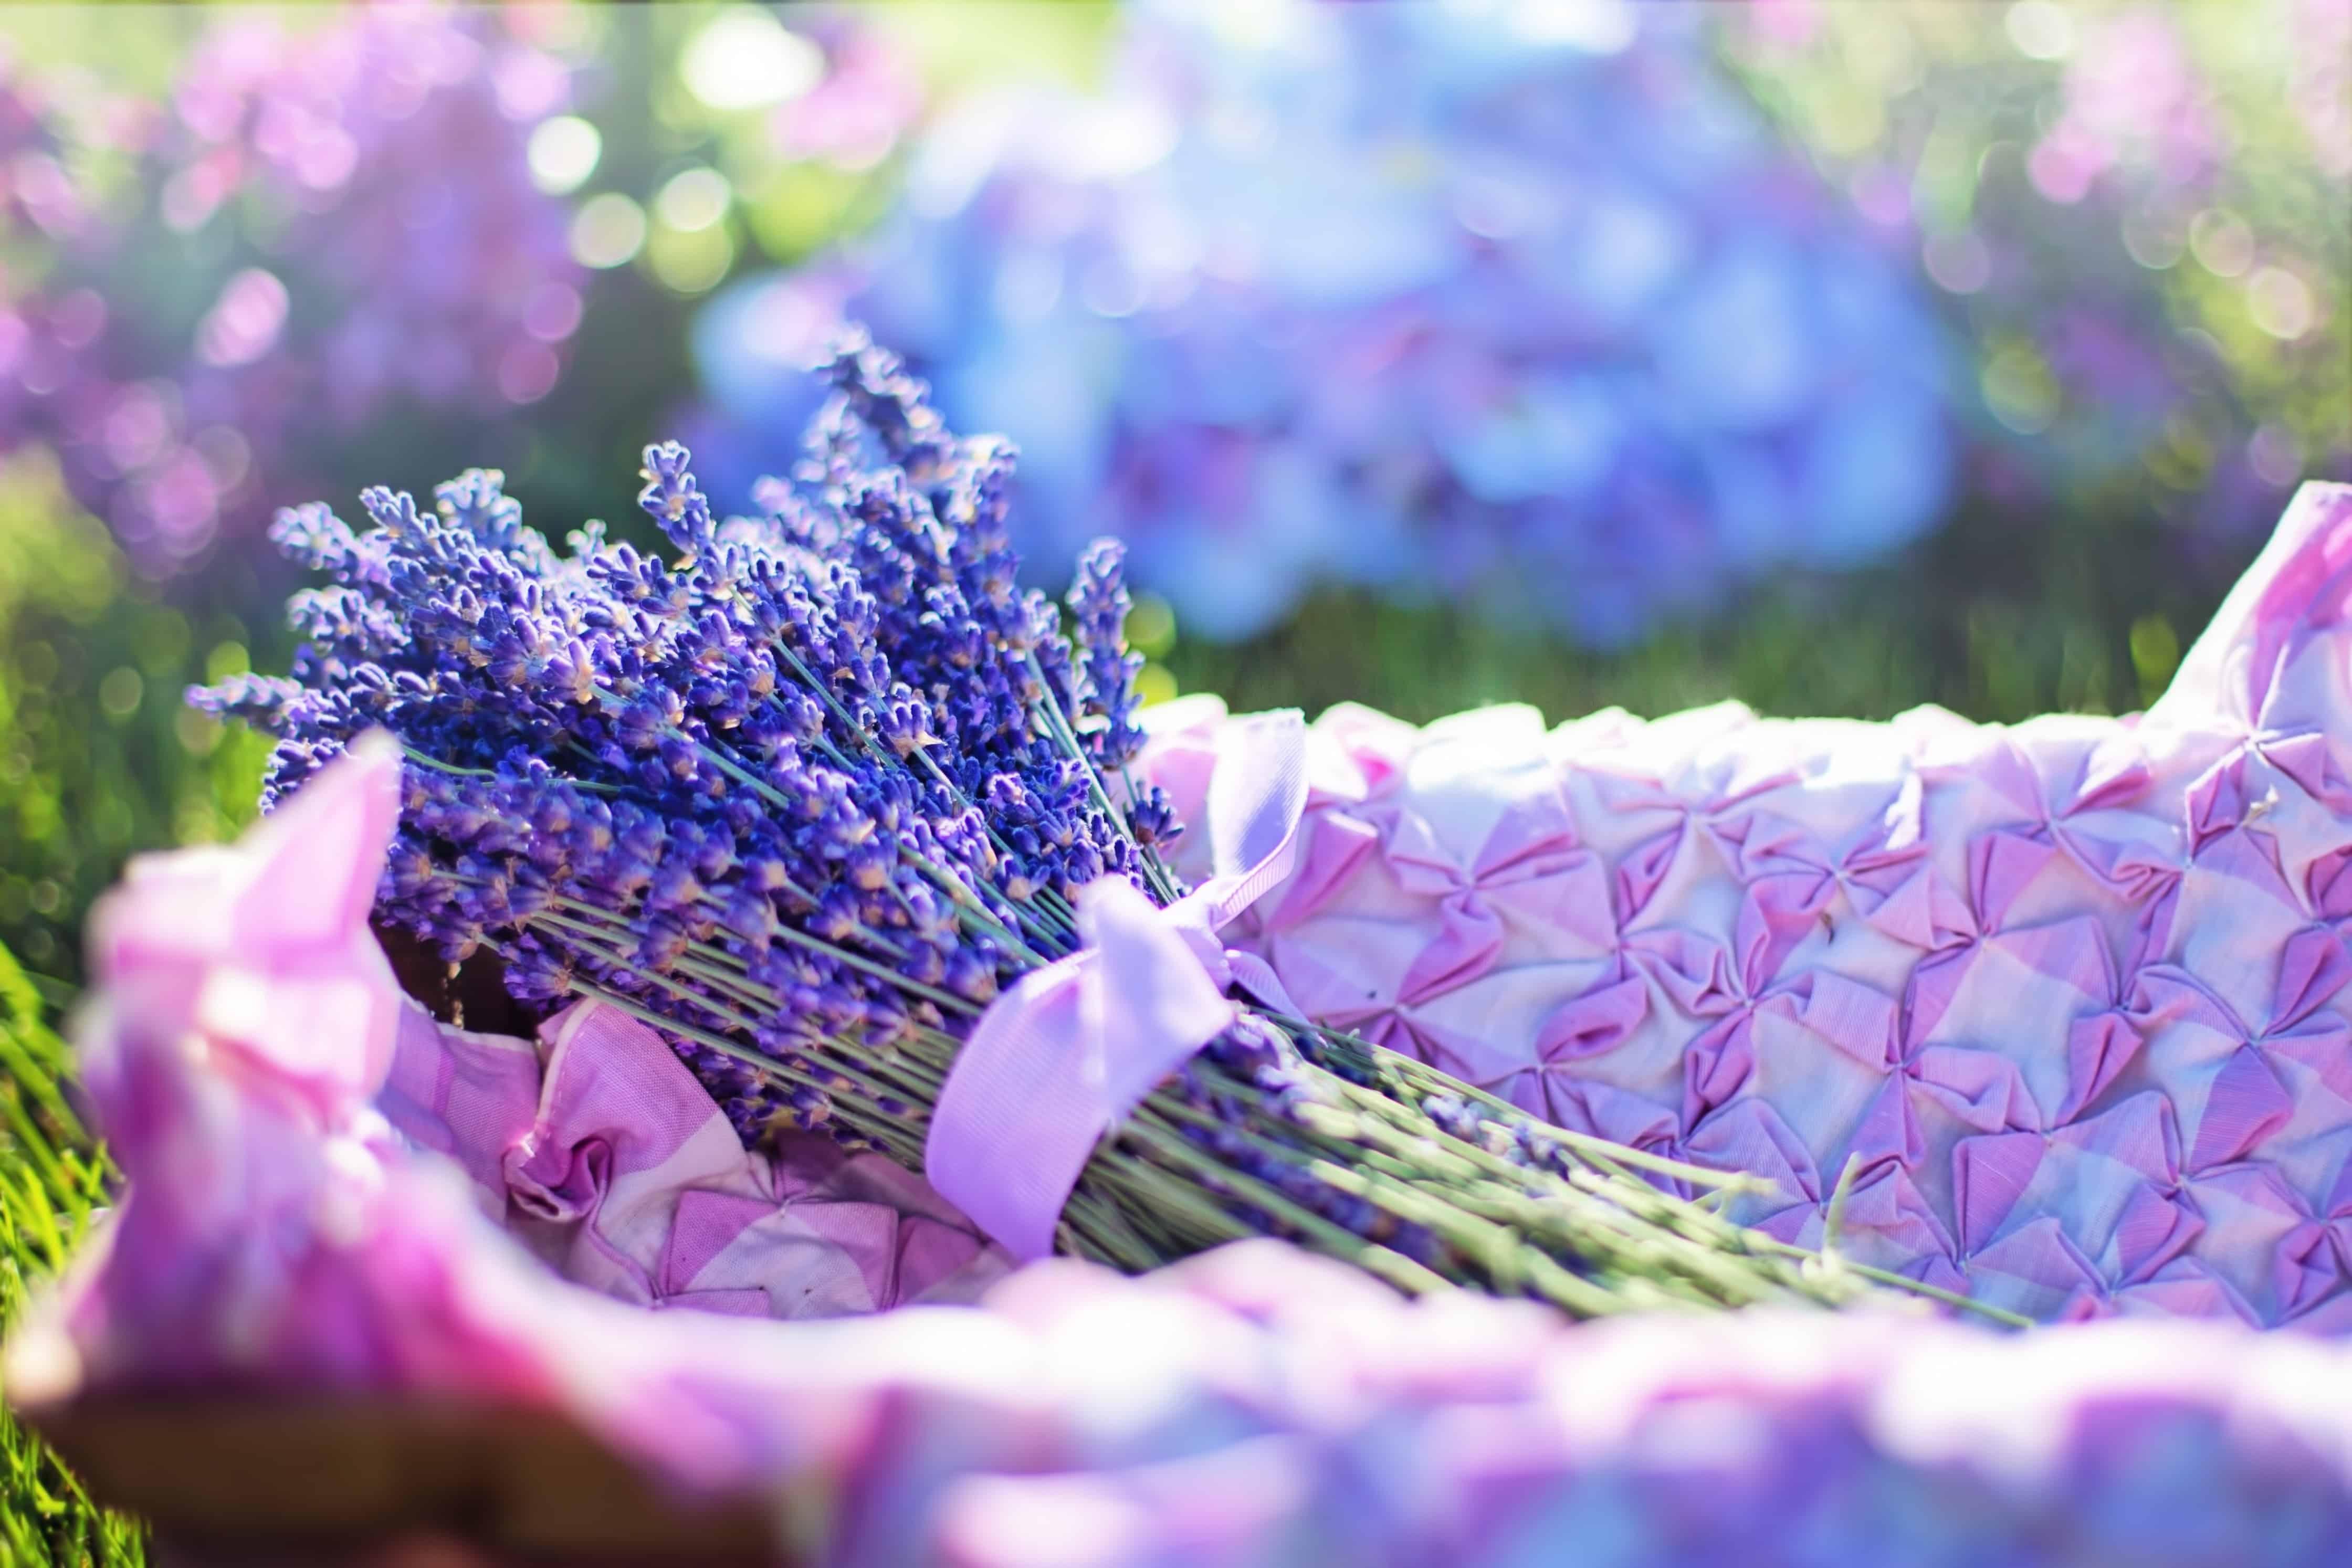 Lavender market, Valensole Plateau in Provence, lavender fields France, Valensole France, lavender fields france season, best time to visit lavender fields france